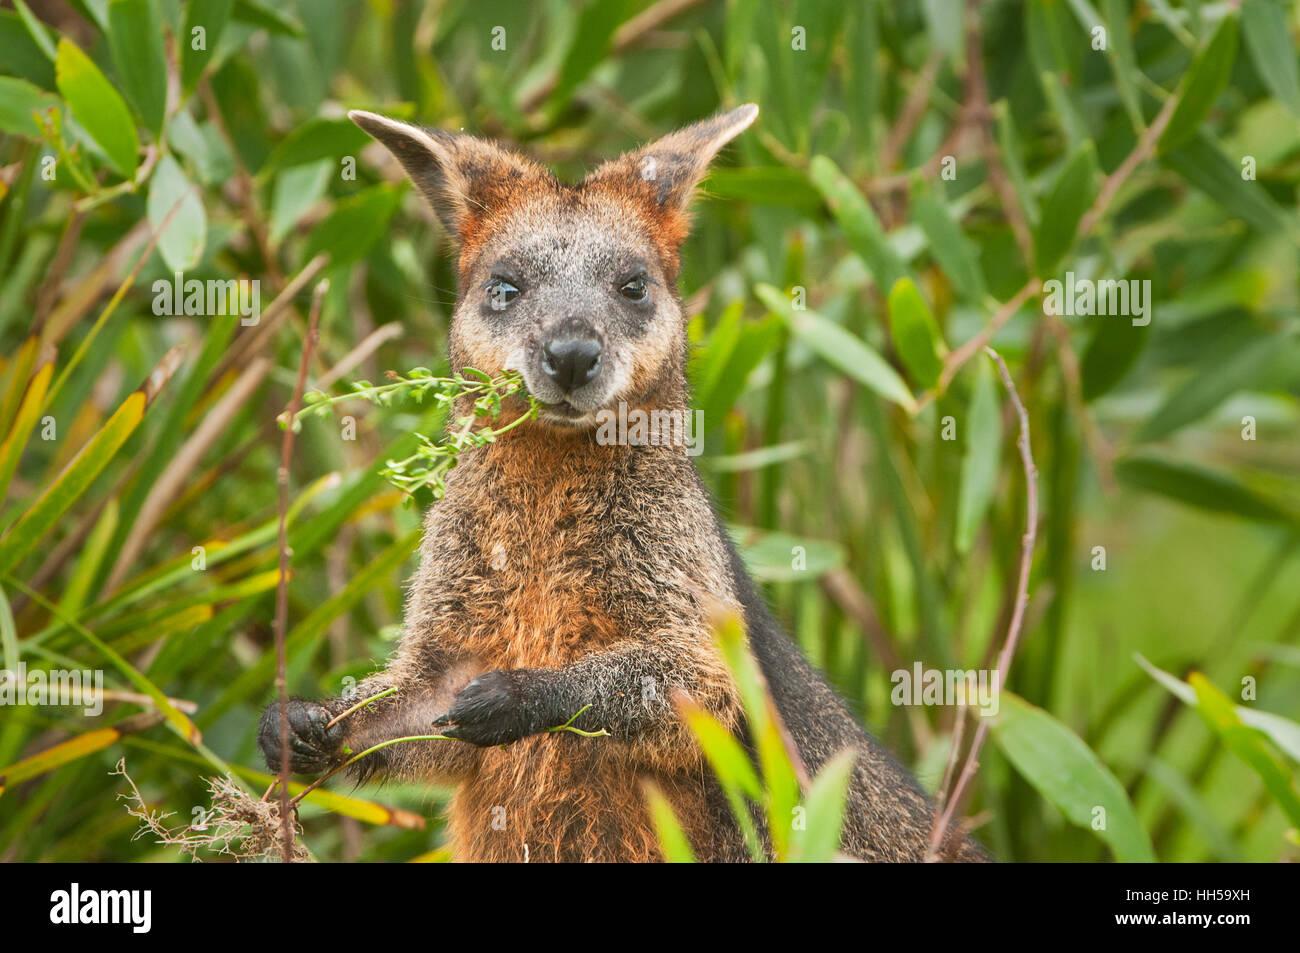 Swamp Wallaby feeding on some eucalyptus blossom. - Stock Image